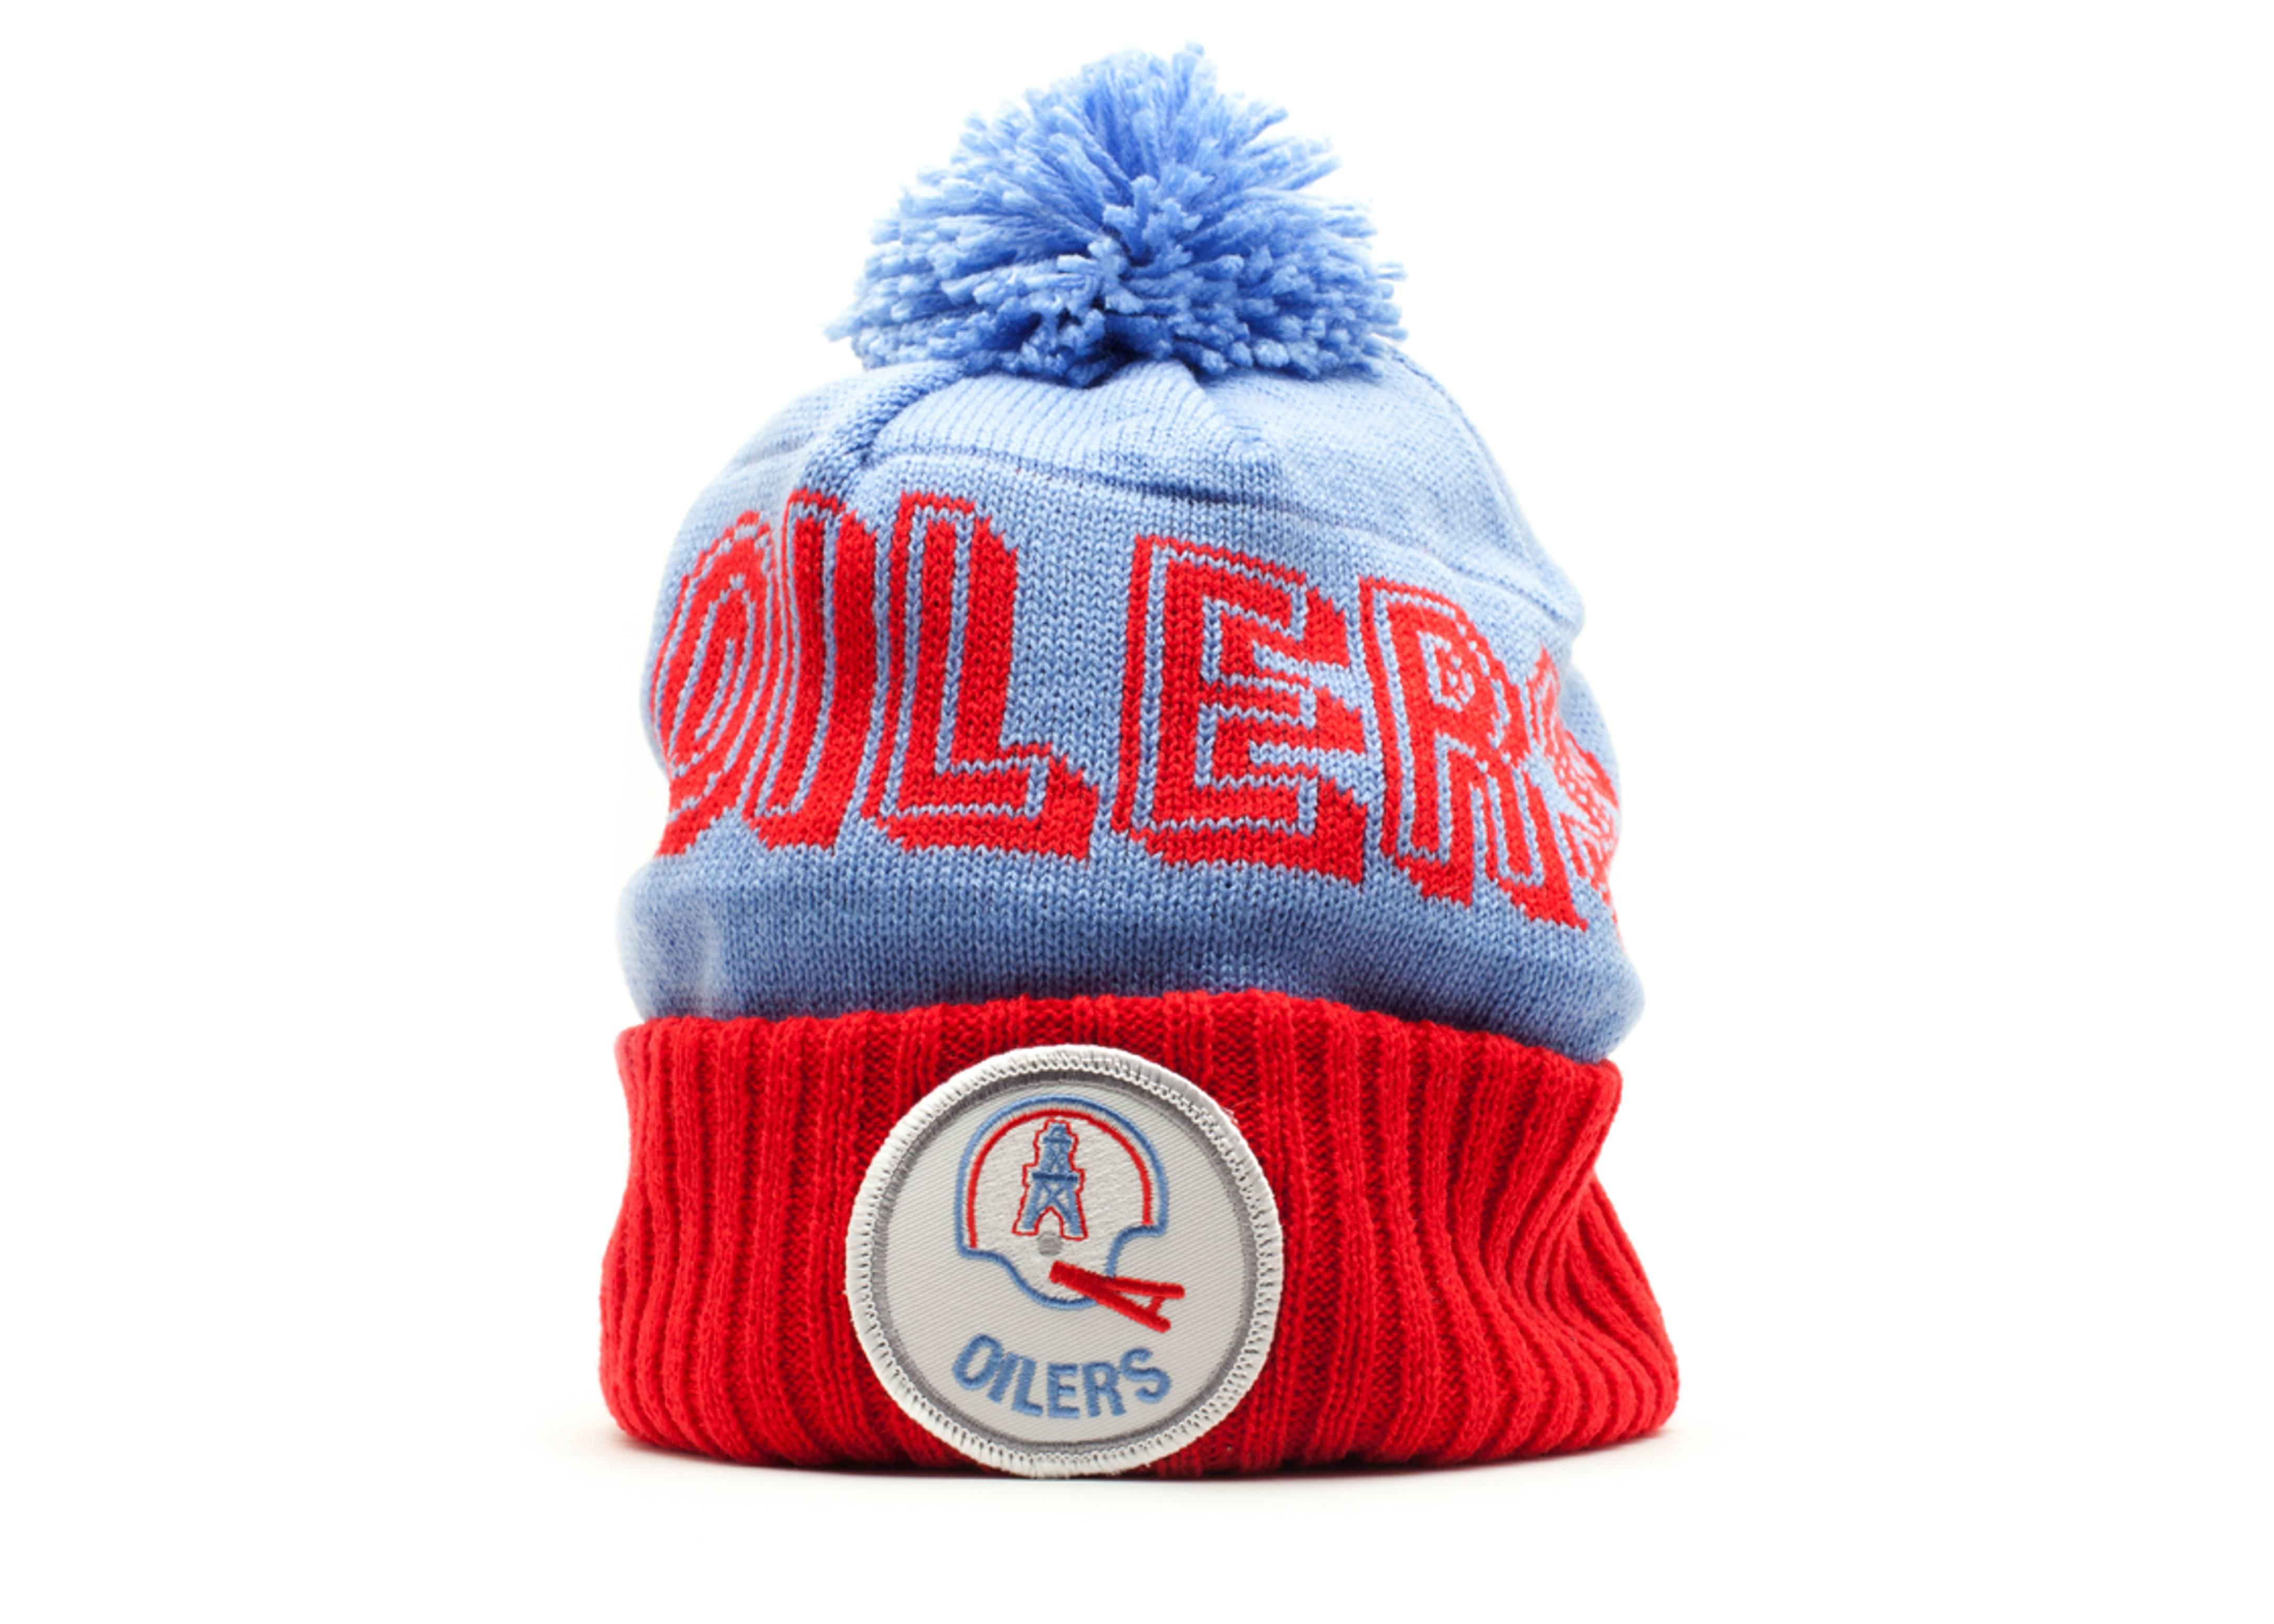 6a29a9944 Houston Oilers Cuffed Pom Knit Beanie - Mitchell   Ness - ke30mtc6oiler - light  blue red